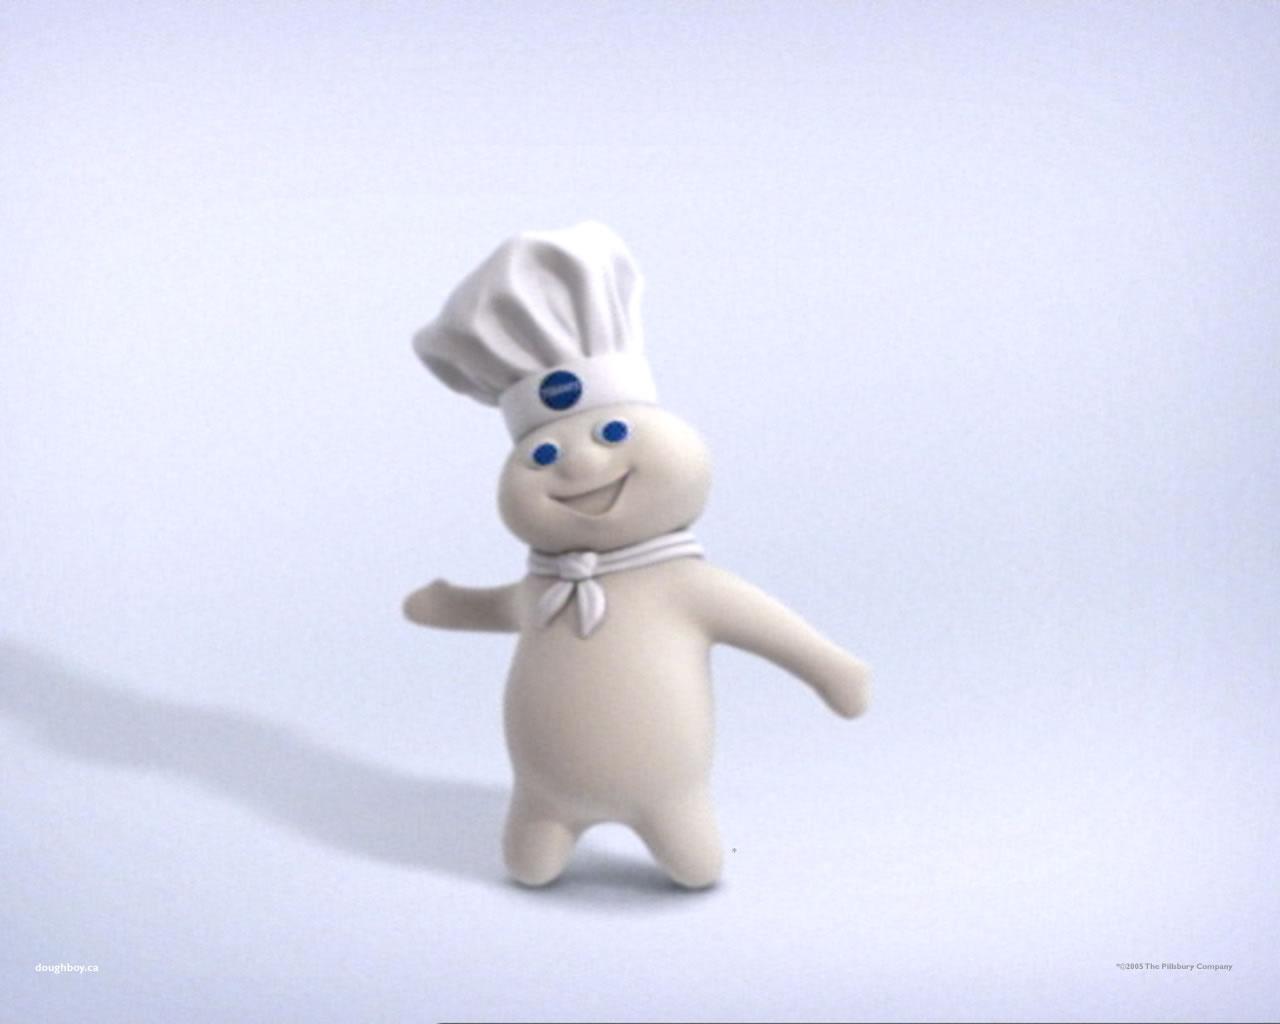 Pillsbury Doughboy Wallpaper Wallpapersafari